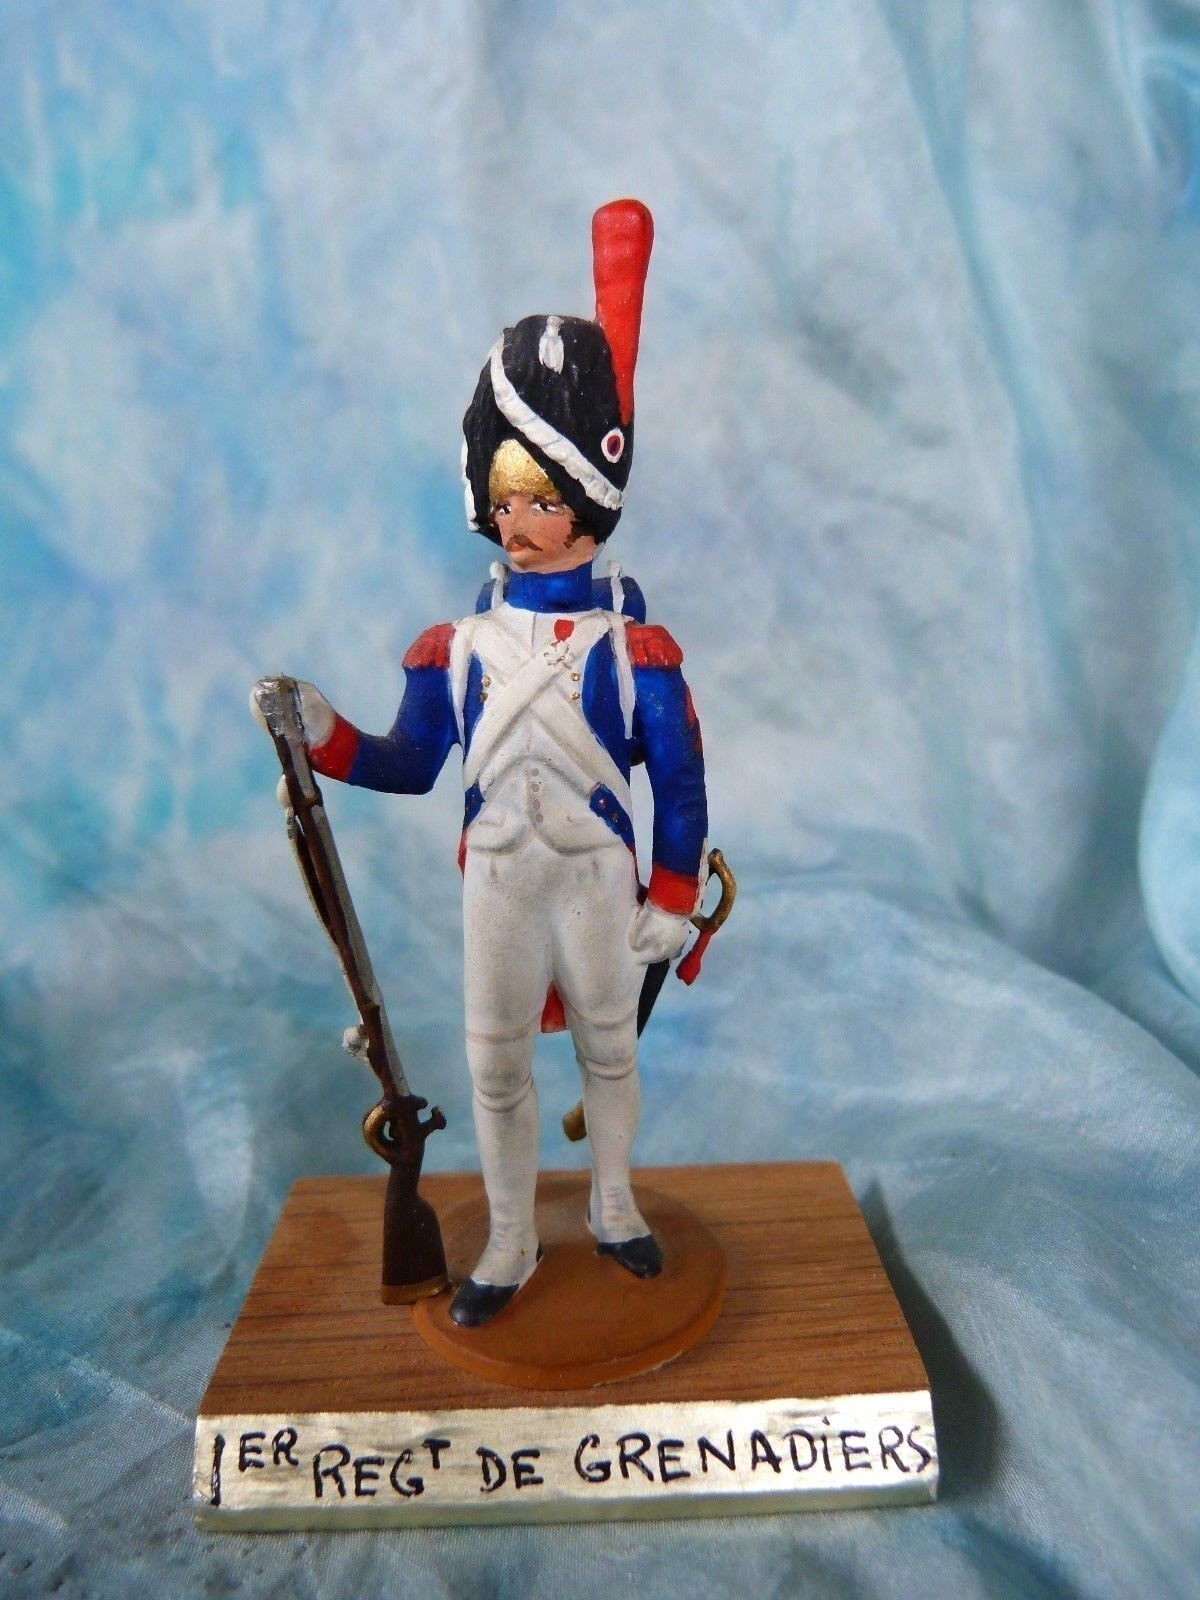 Soldat de plomb Guy Renaud 1er empire - 1er régiment de grenadier - Toy soldier